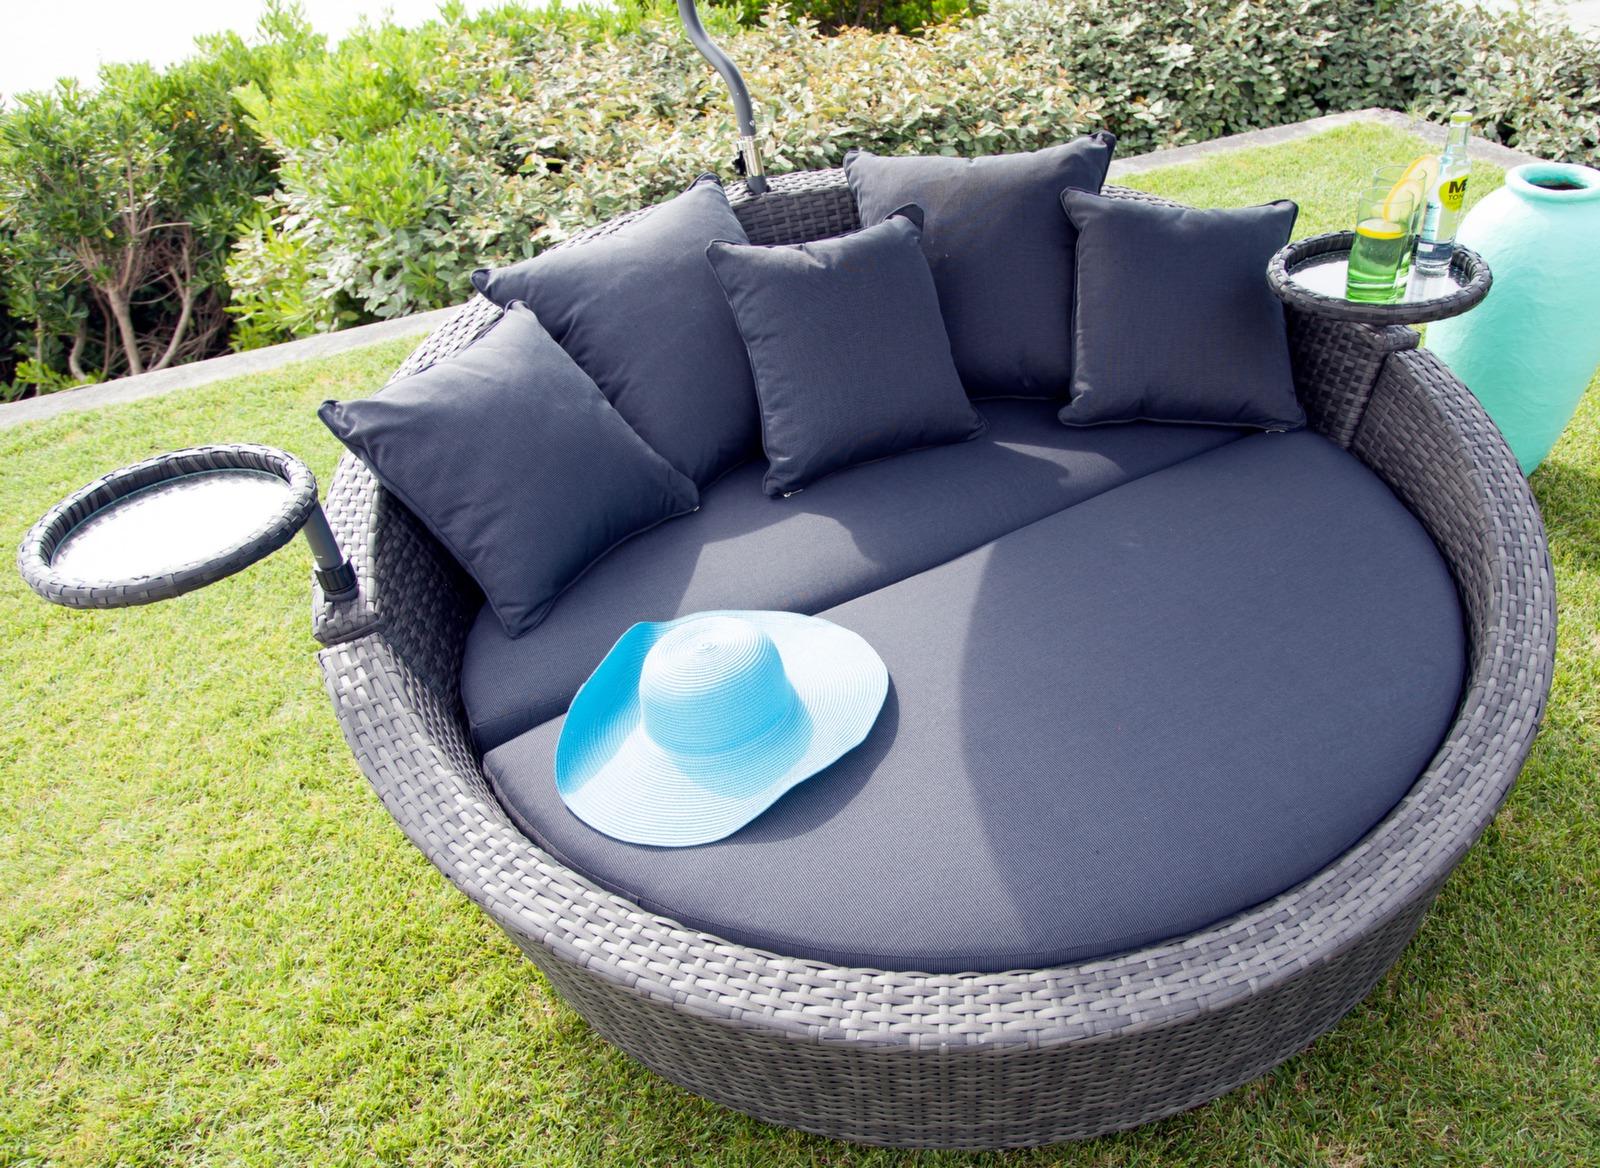 Canapé lit de jardin haut de gamme Melrose - Gamme Océo - Proloisirs